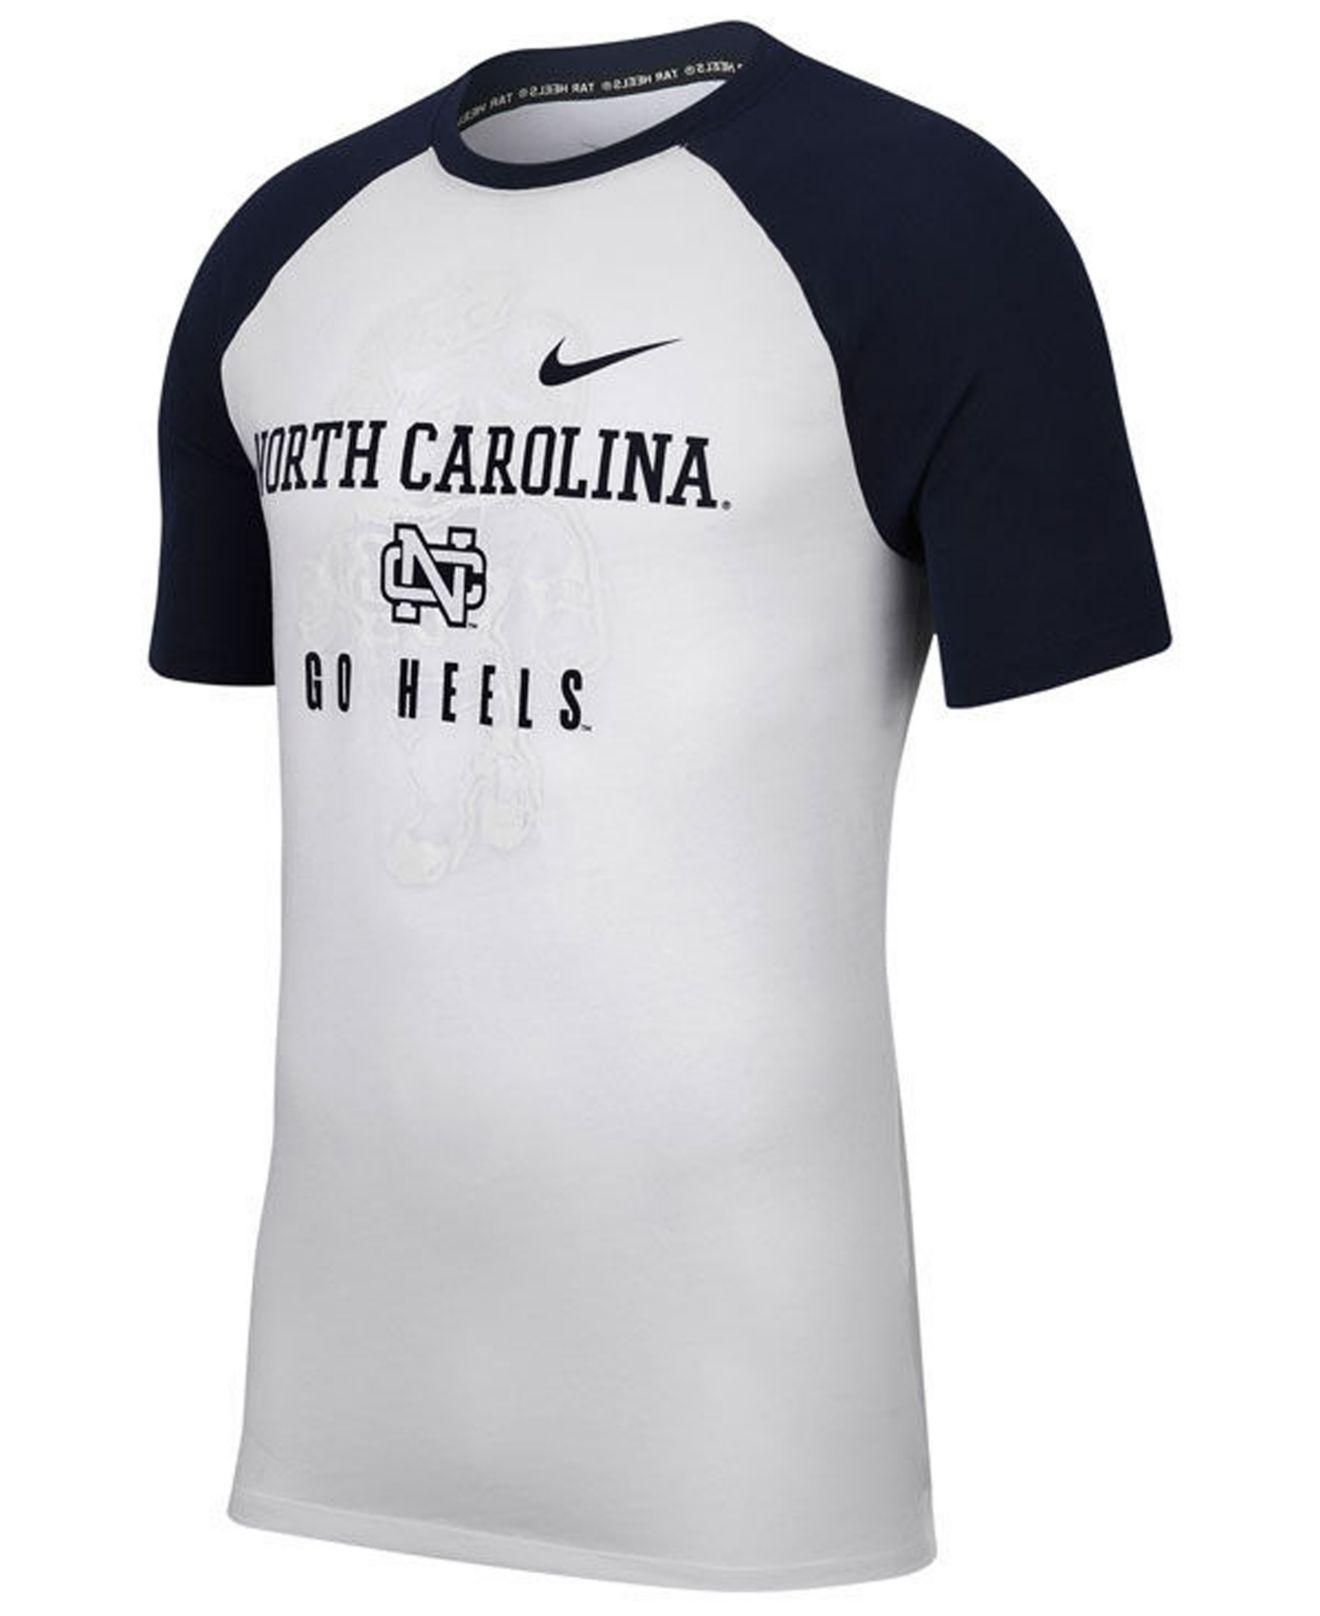 b473d86acf3f Lyst - Nike North Carolina Tar Heels Vault Raglan T-shirt in White ...